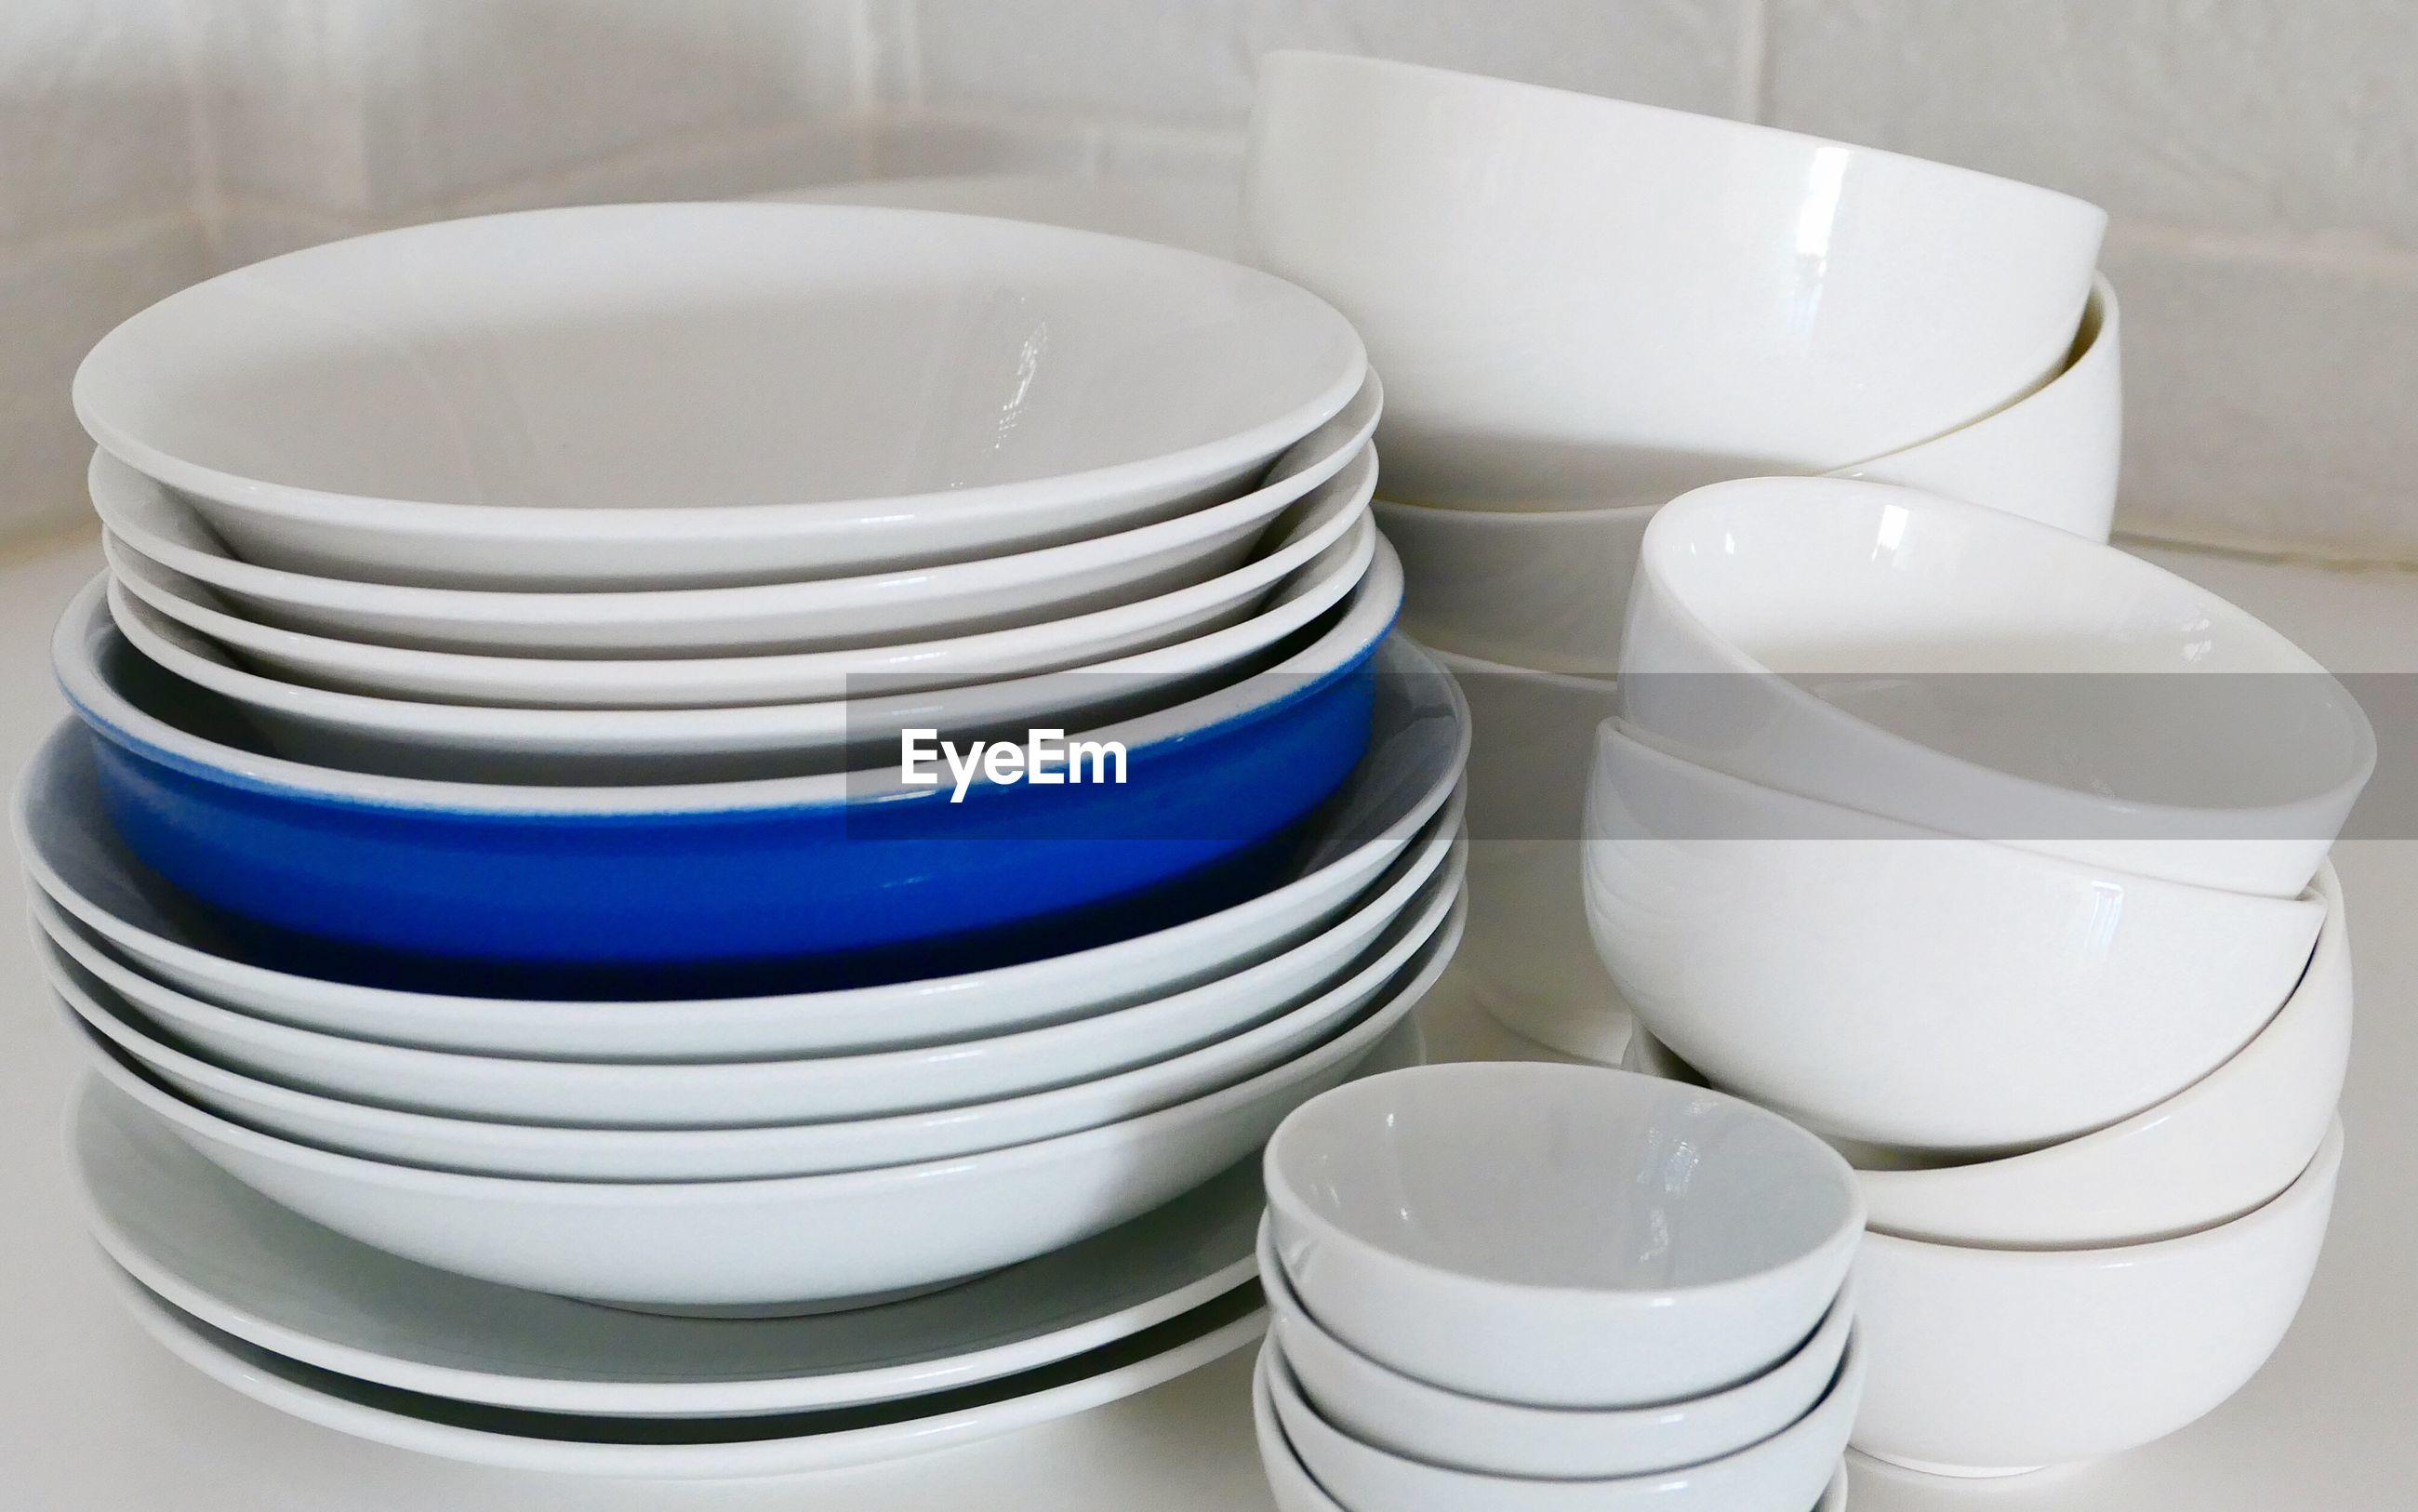 Close-up of empty bowls